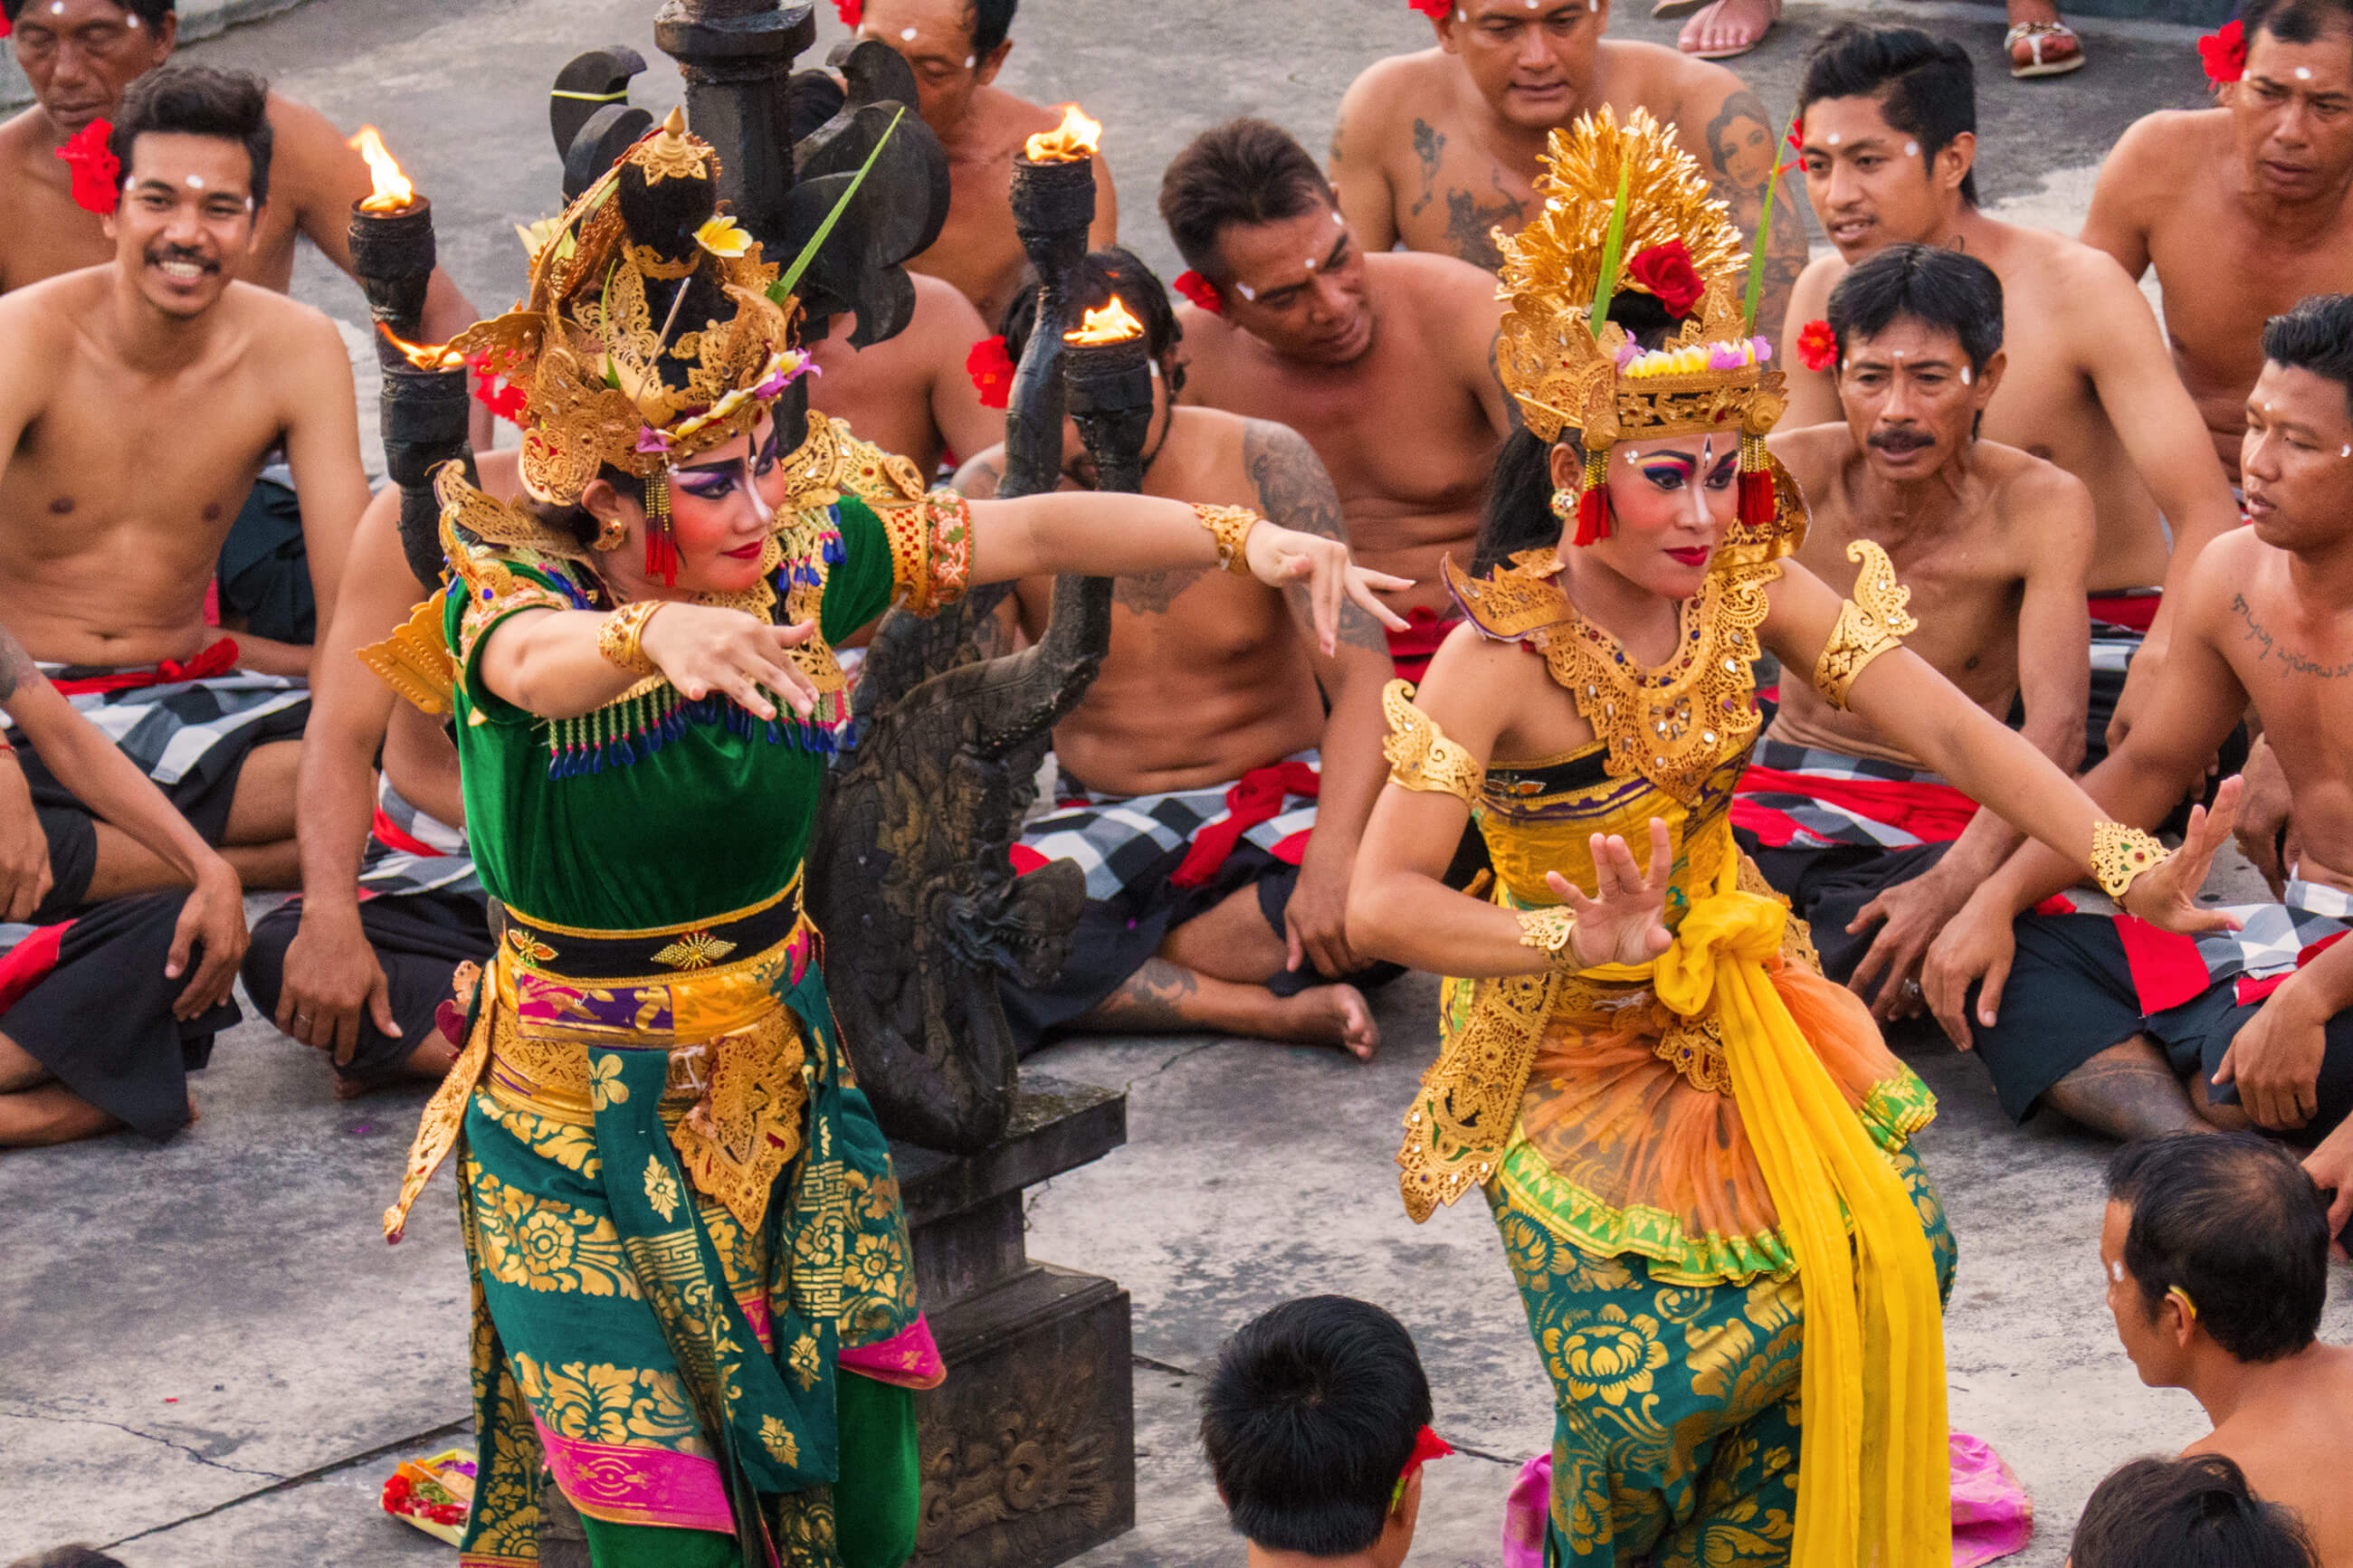 https://bubo.sk/uploads/galleries/7339/martin_simko_indonezia_bali_uluwatu_kecak-dance.jpg